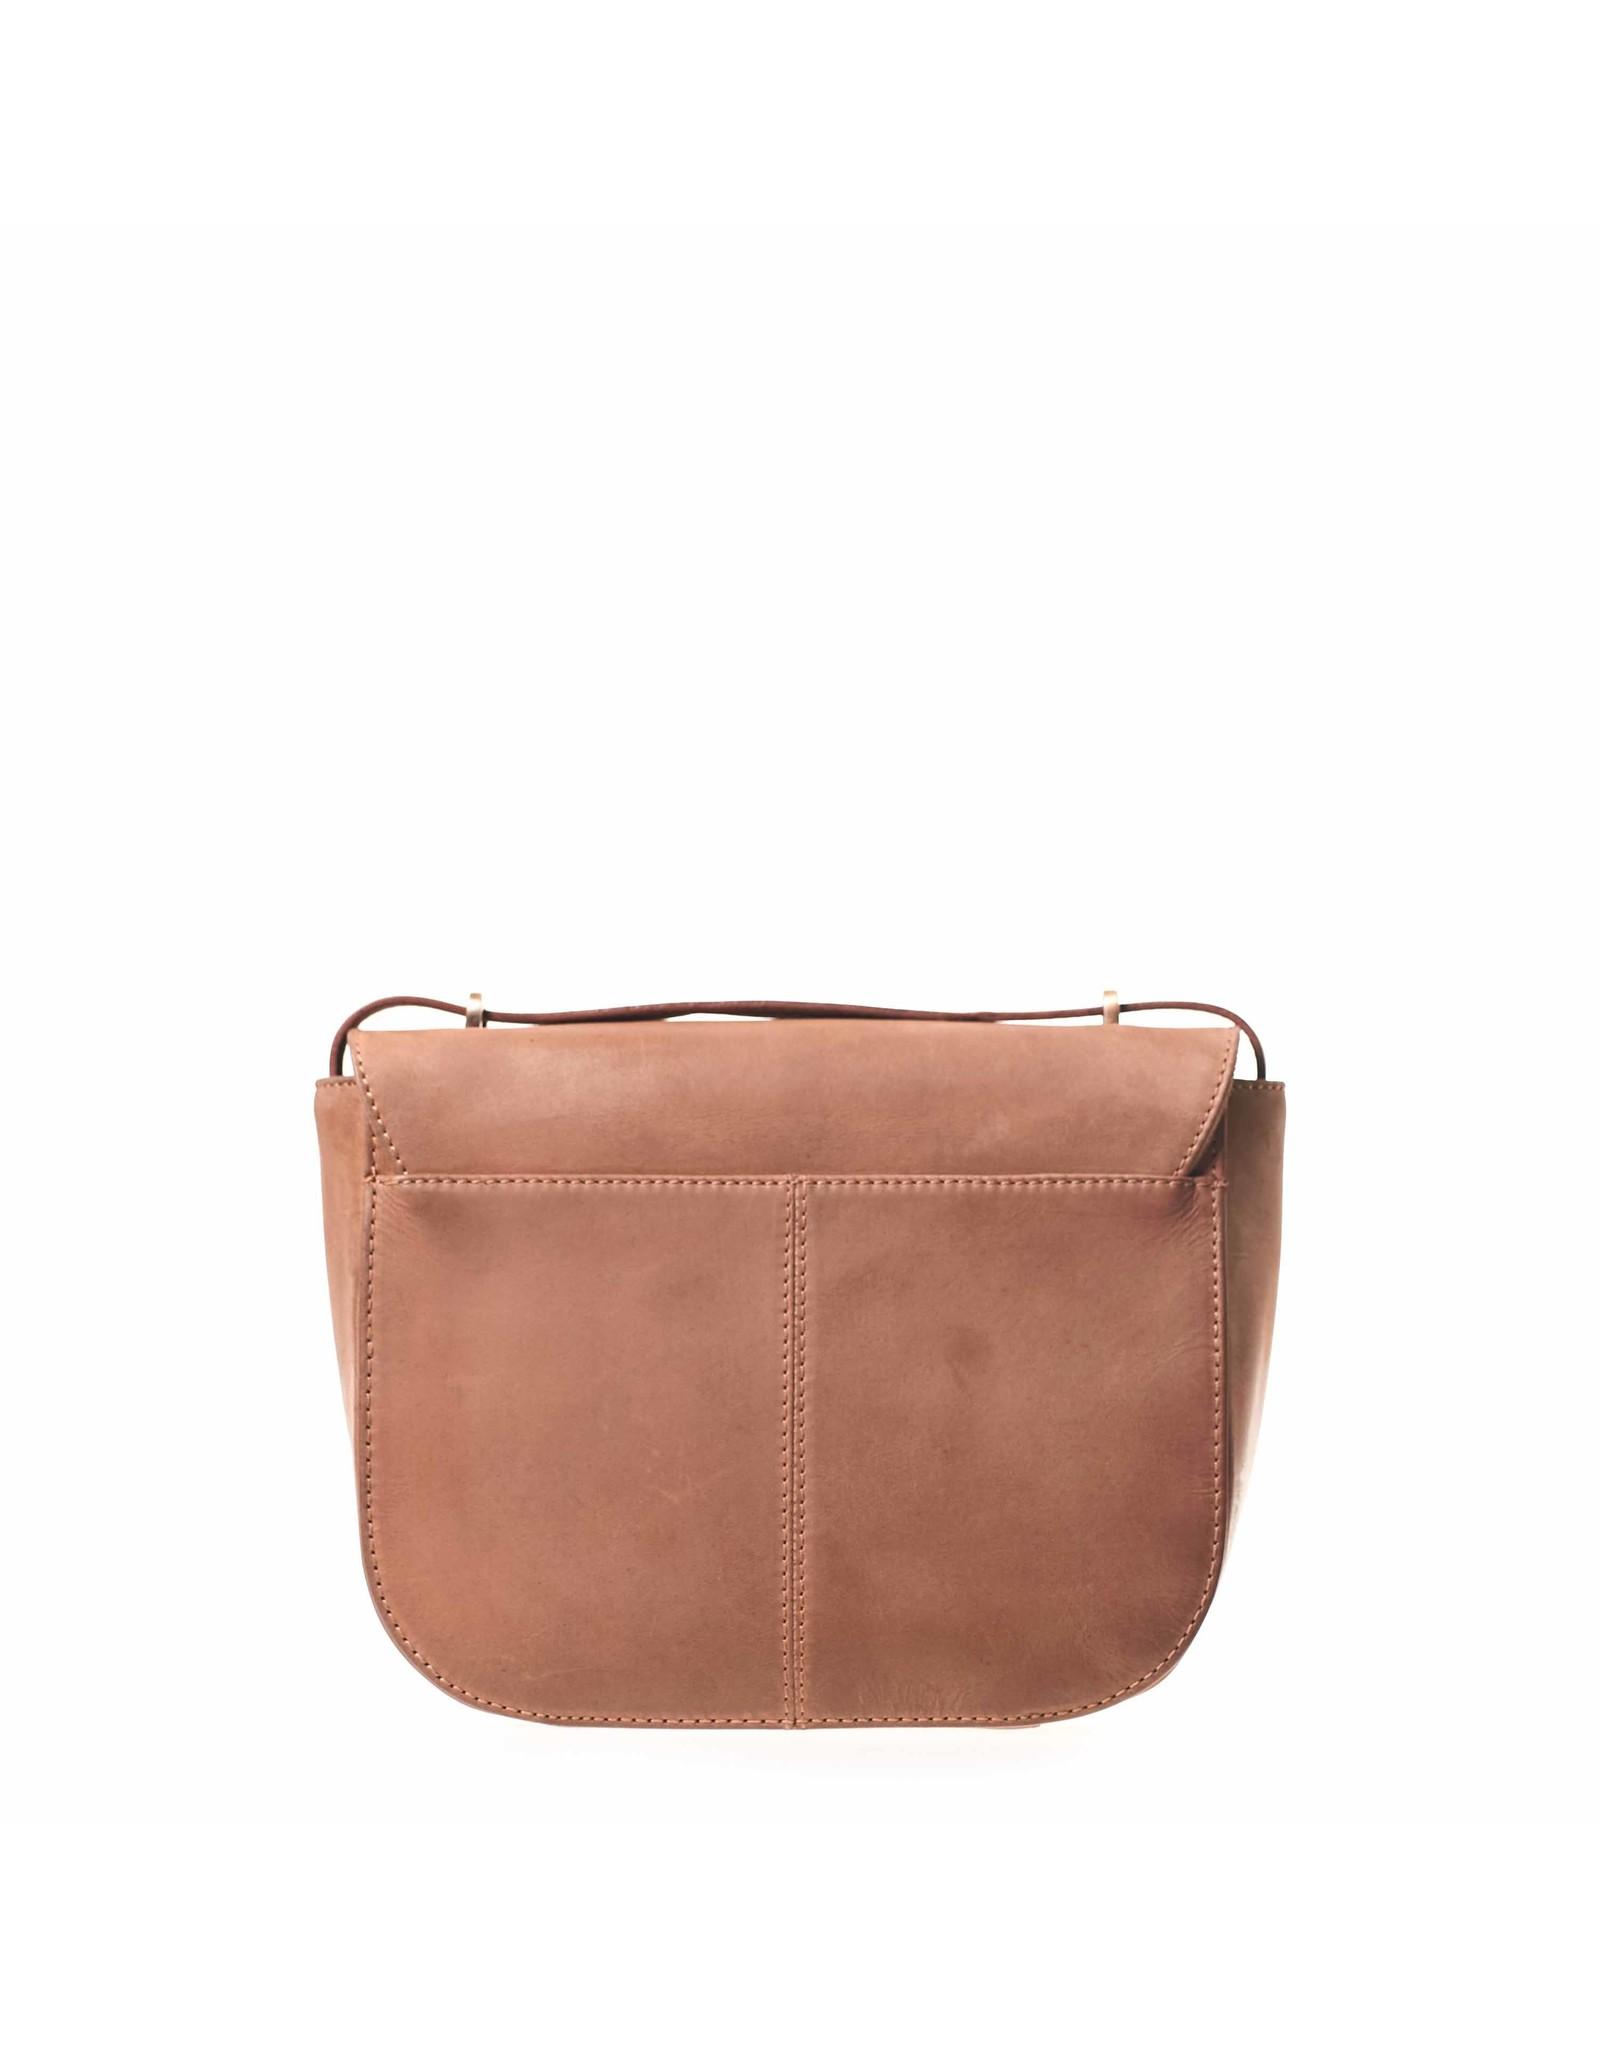 O MY BAG Meghan